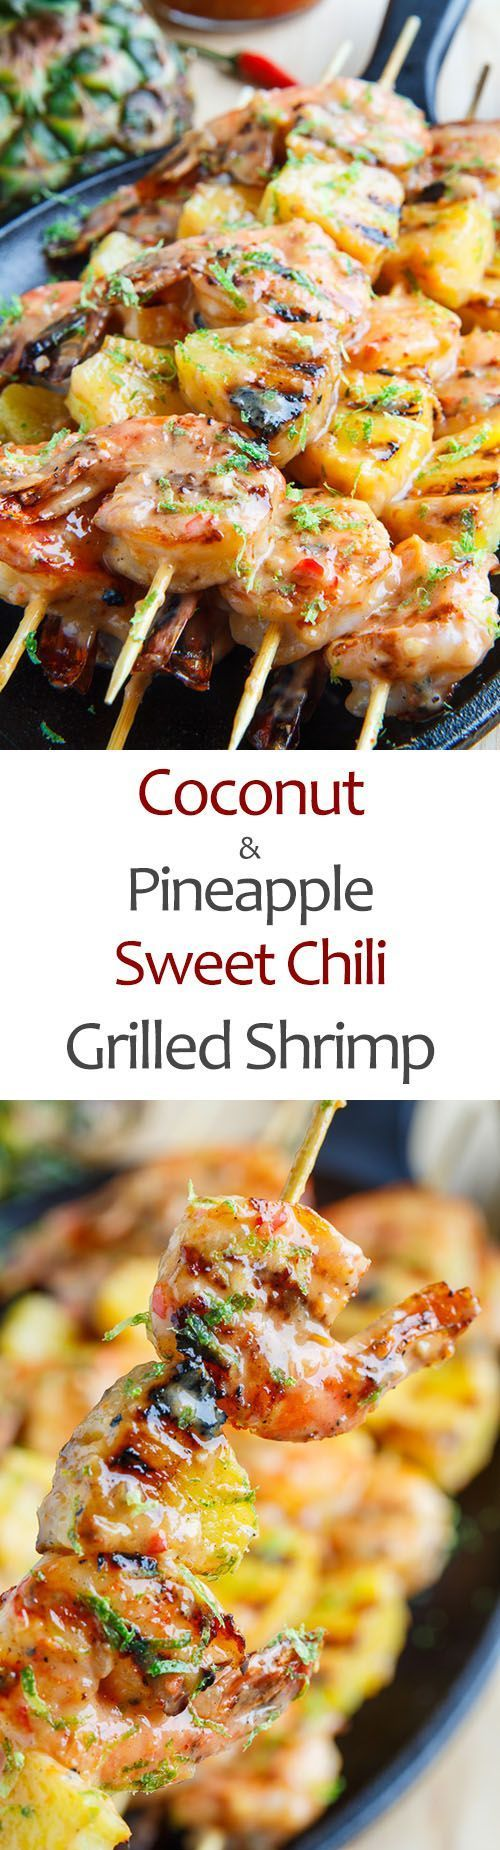 #glutenfree #pineapple #pineapple #grainfree #grilled